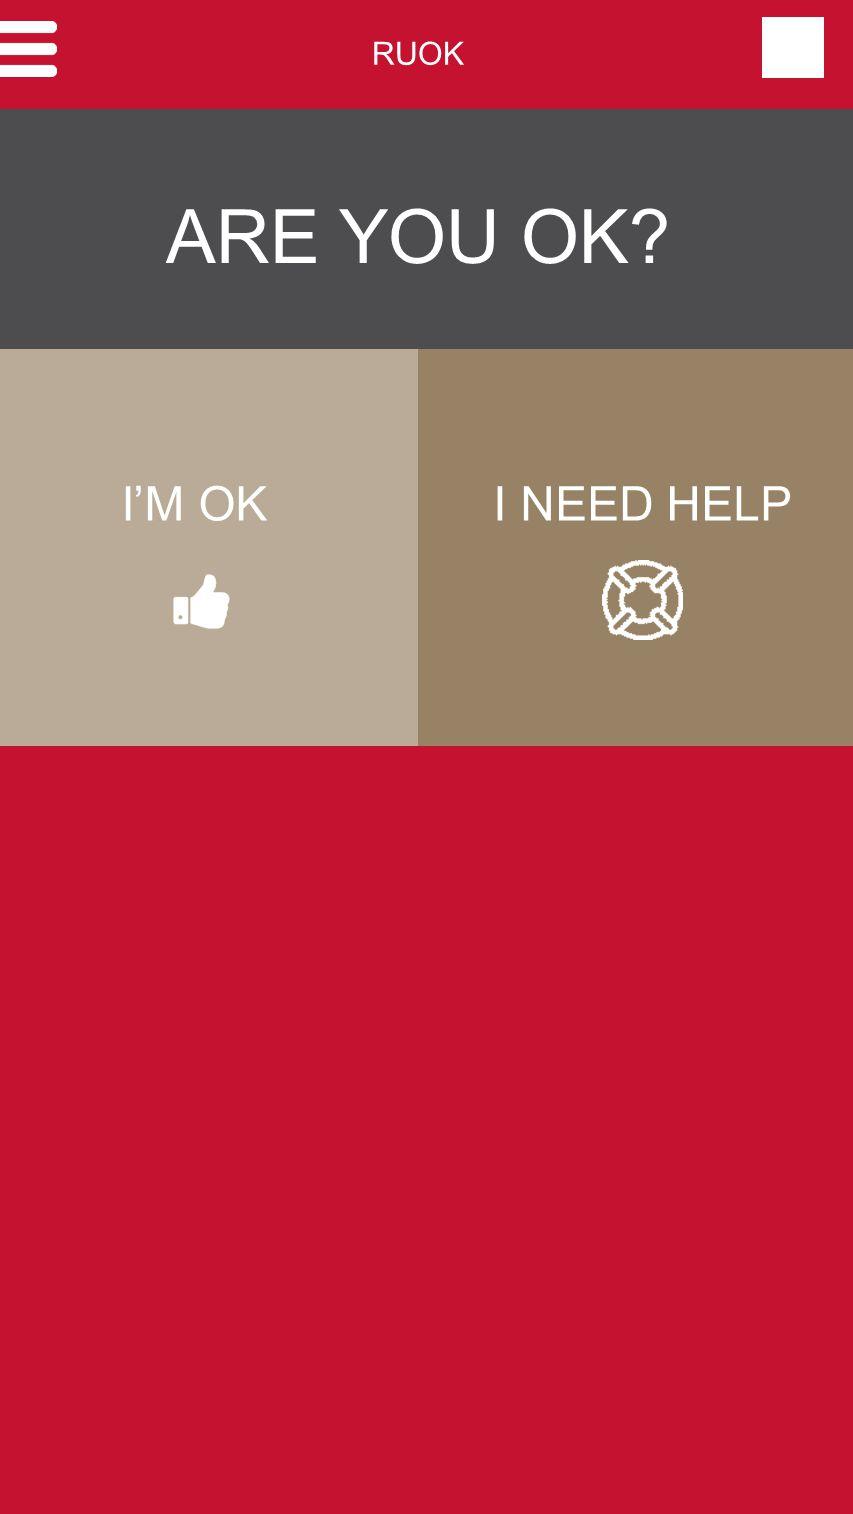 ARE YOU OK? I'M OKI NEED HELP RUOK